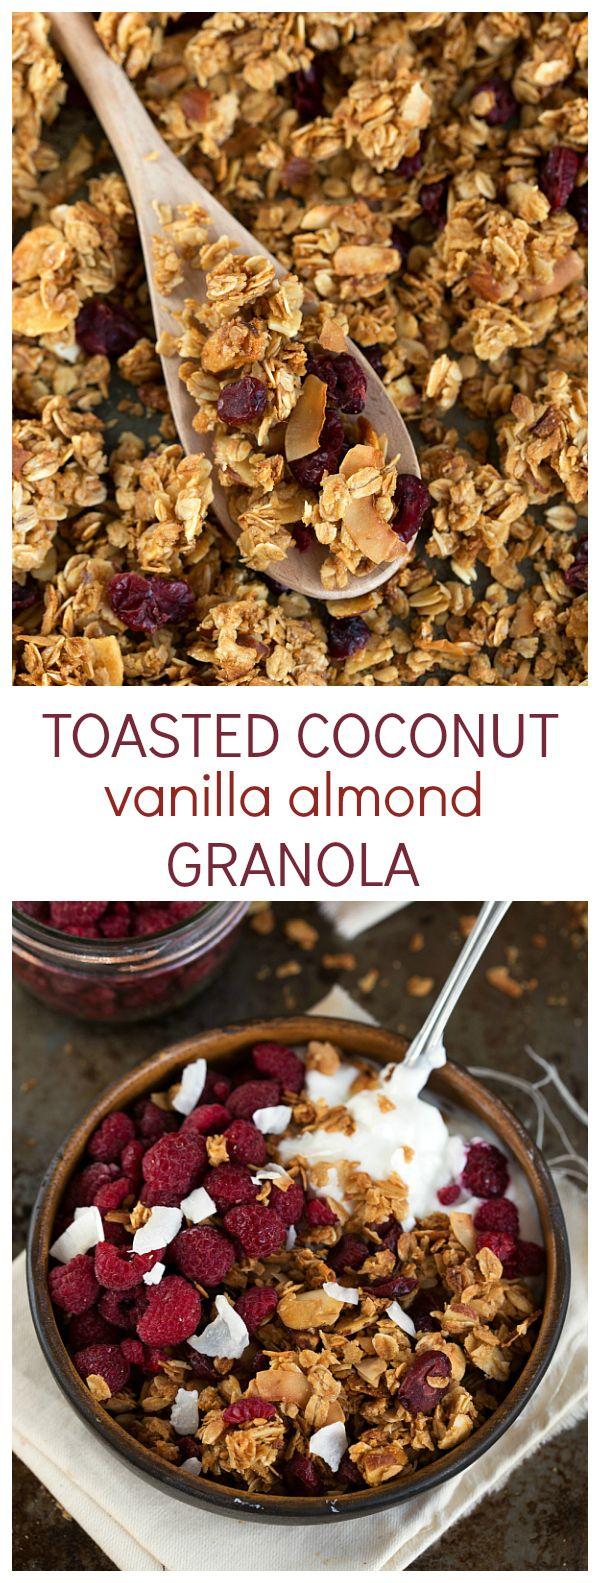 CocoNut Oil on | Recipes - Granola | Granola, Healthy Snacks, Honey